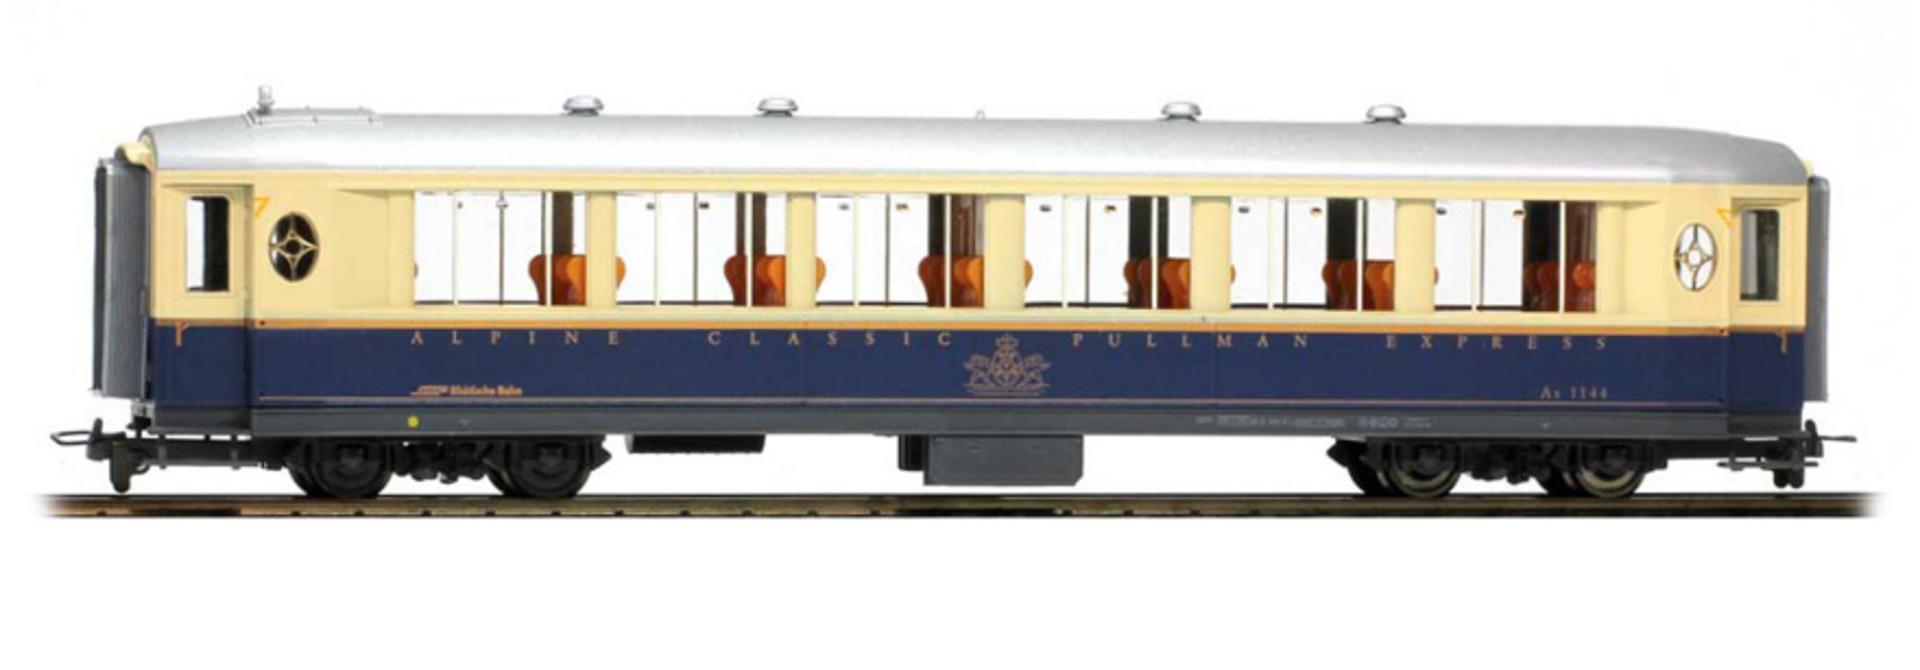 "3272124 RhB As 1144 Salonwagen ""ACPE"""